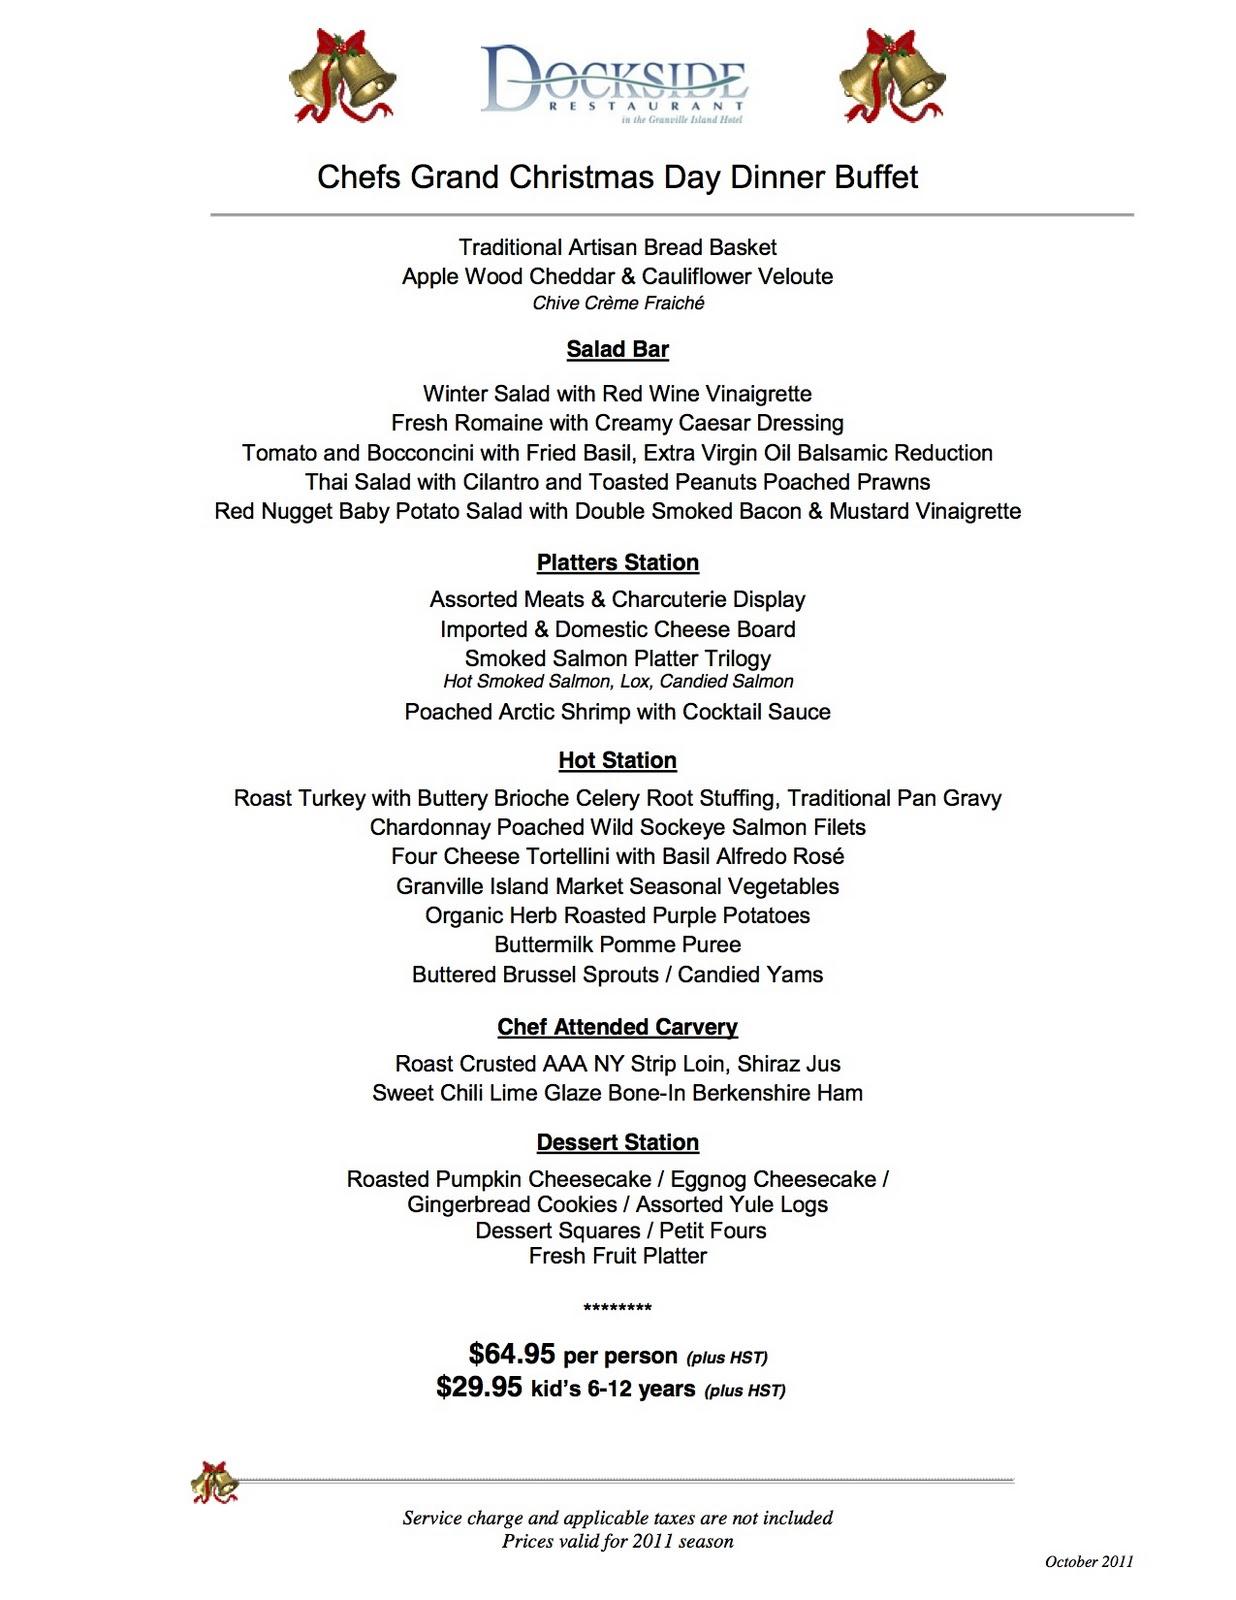 Christmas Buffet Menus.A Christmas Story Dinner Menu Thecannonball Org